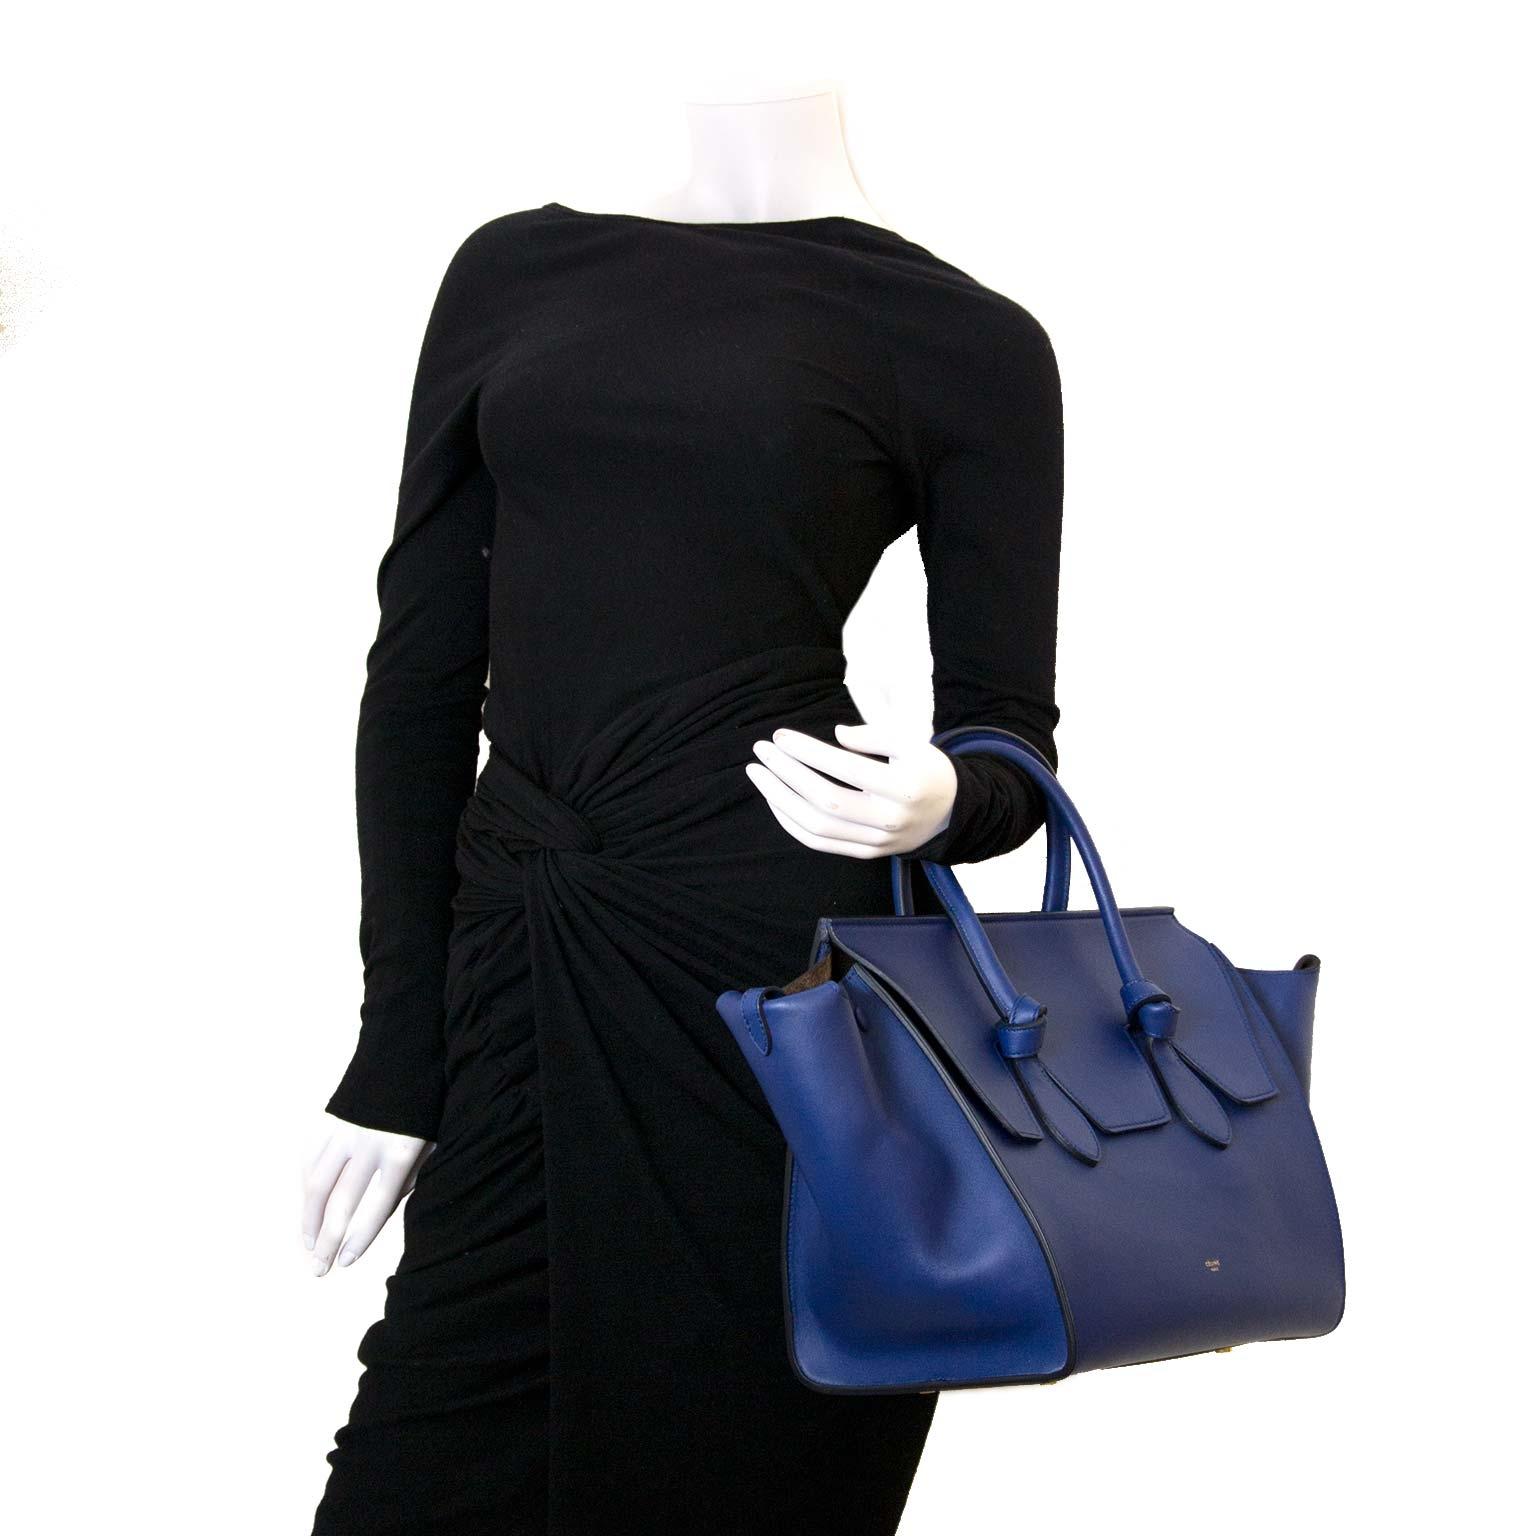 988382e5f8 Koop authentieke tweedehands Celine Buy authentic secondhand Celine bag at  Labellov. Safe online shopping. Koop authentieke tweedehands Celine